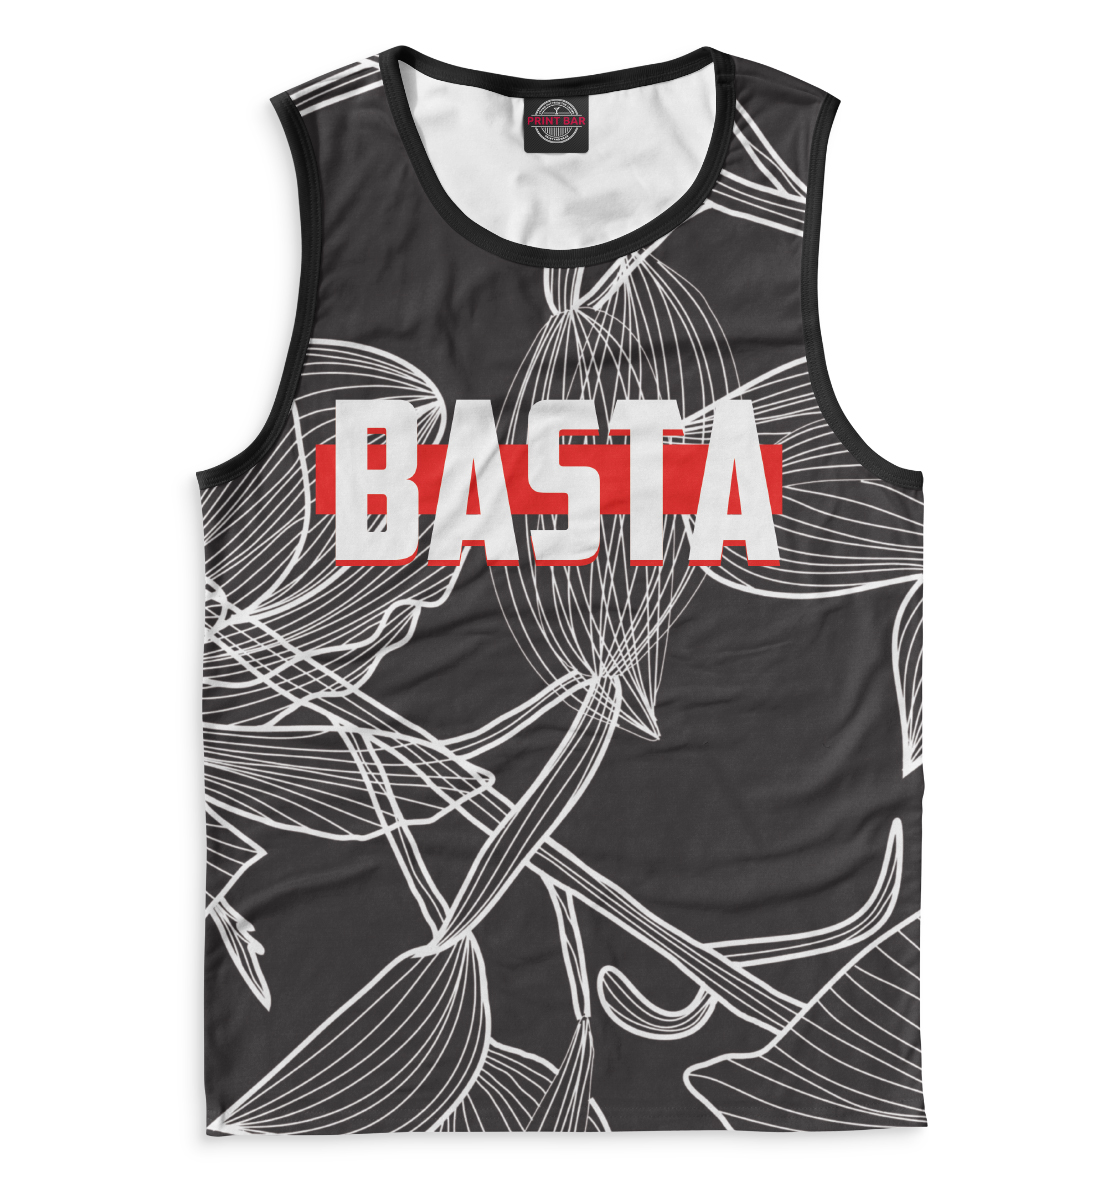 Купить Баста, Printbar, Майки, BST-102363-may-2